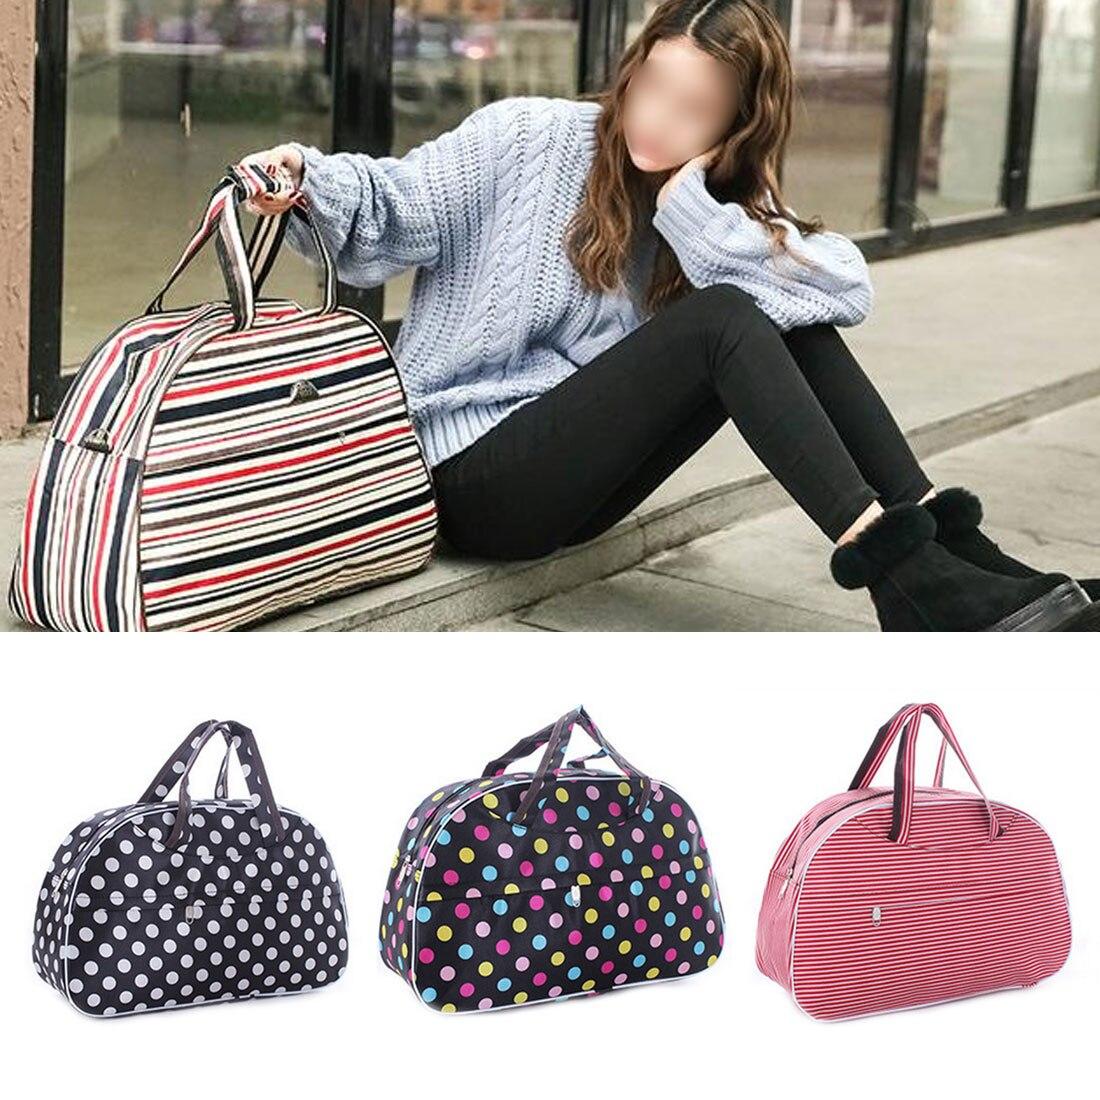 Women Travel Bags Handbags New Hot Fashion Portable Luggage Bag Floral Print Duffel Bags Waterproof Weekend Duffle Bag